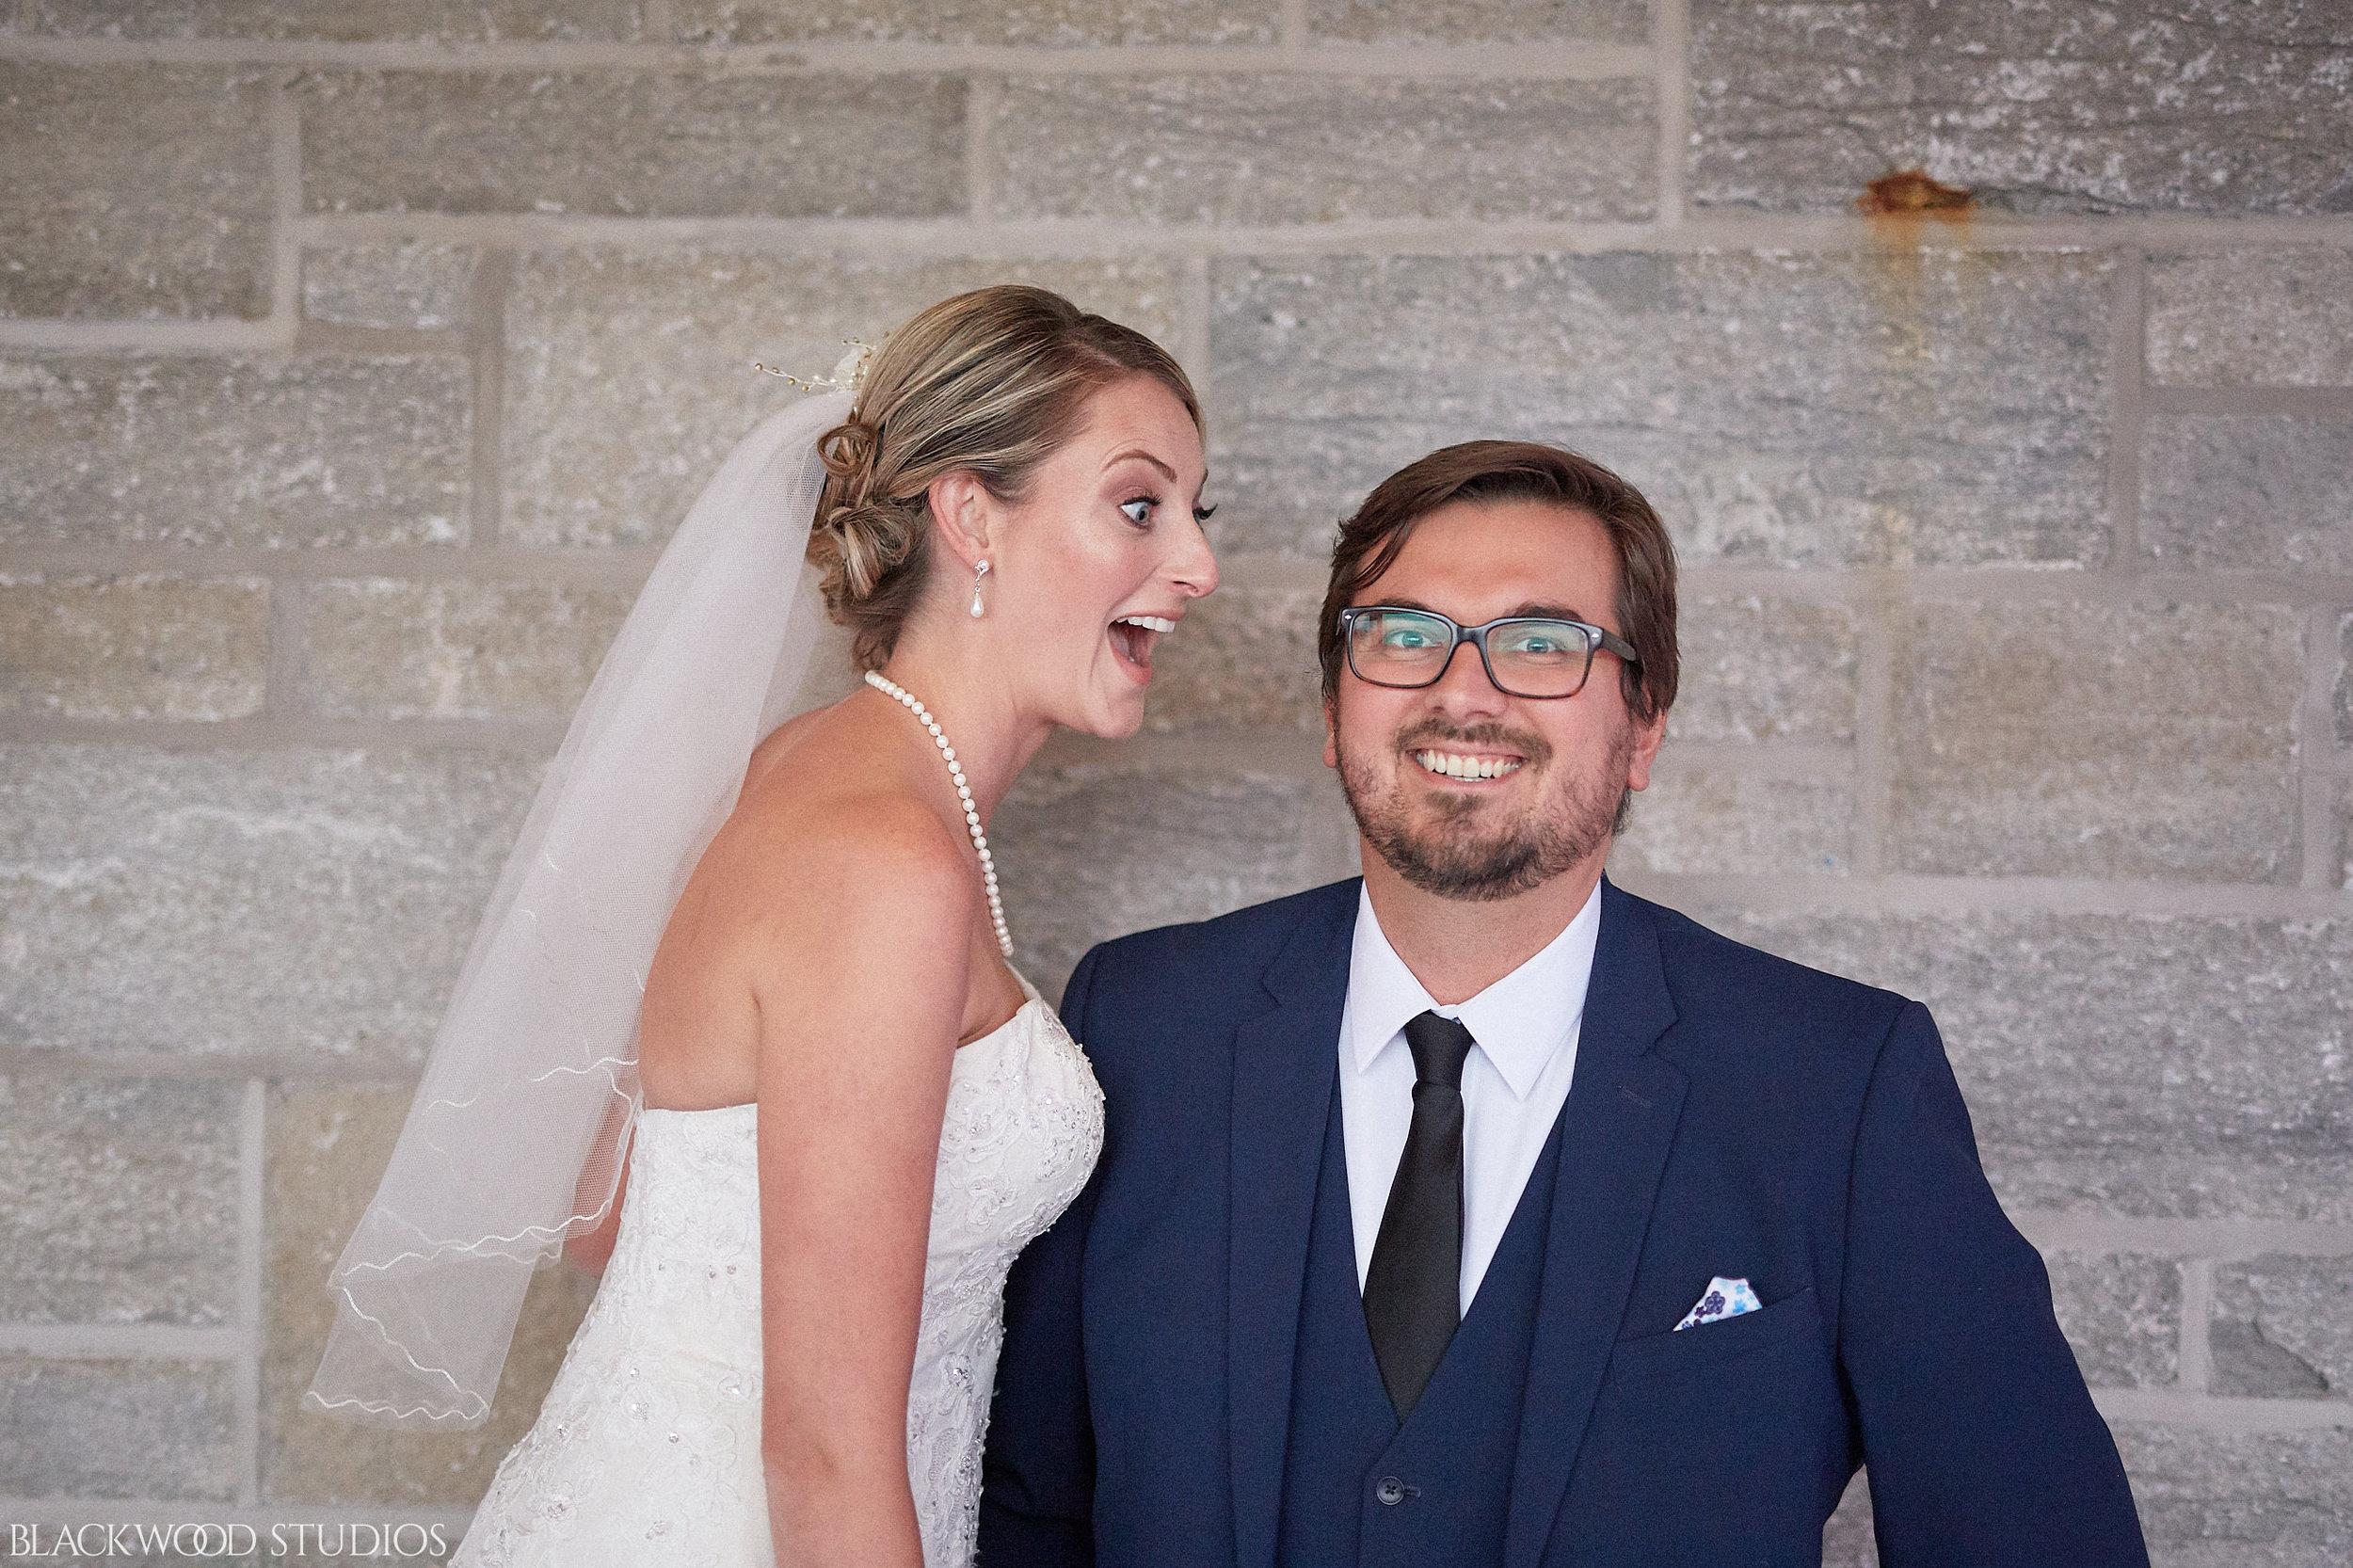 Blackwood-Studios-Wedding-Photography-20170928-185004-Marek-Katie-Michalek-Oakes-Garden-Theatre-Niagara-Falls-Ontario-Canada.jpg